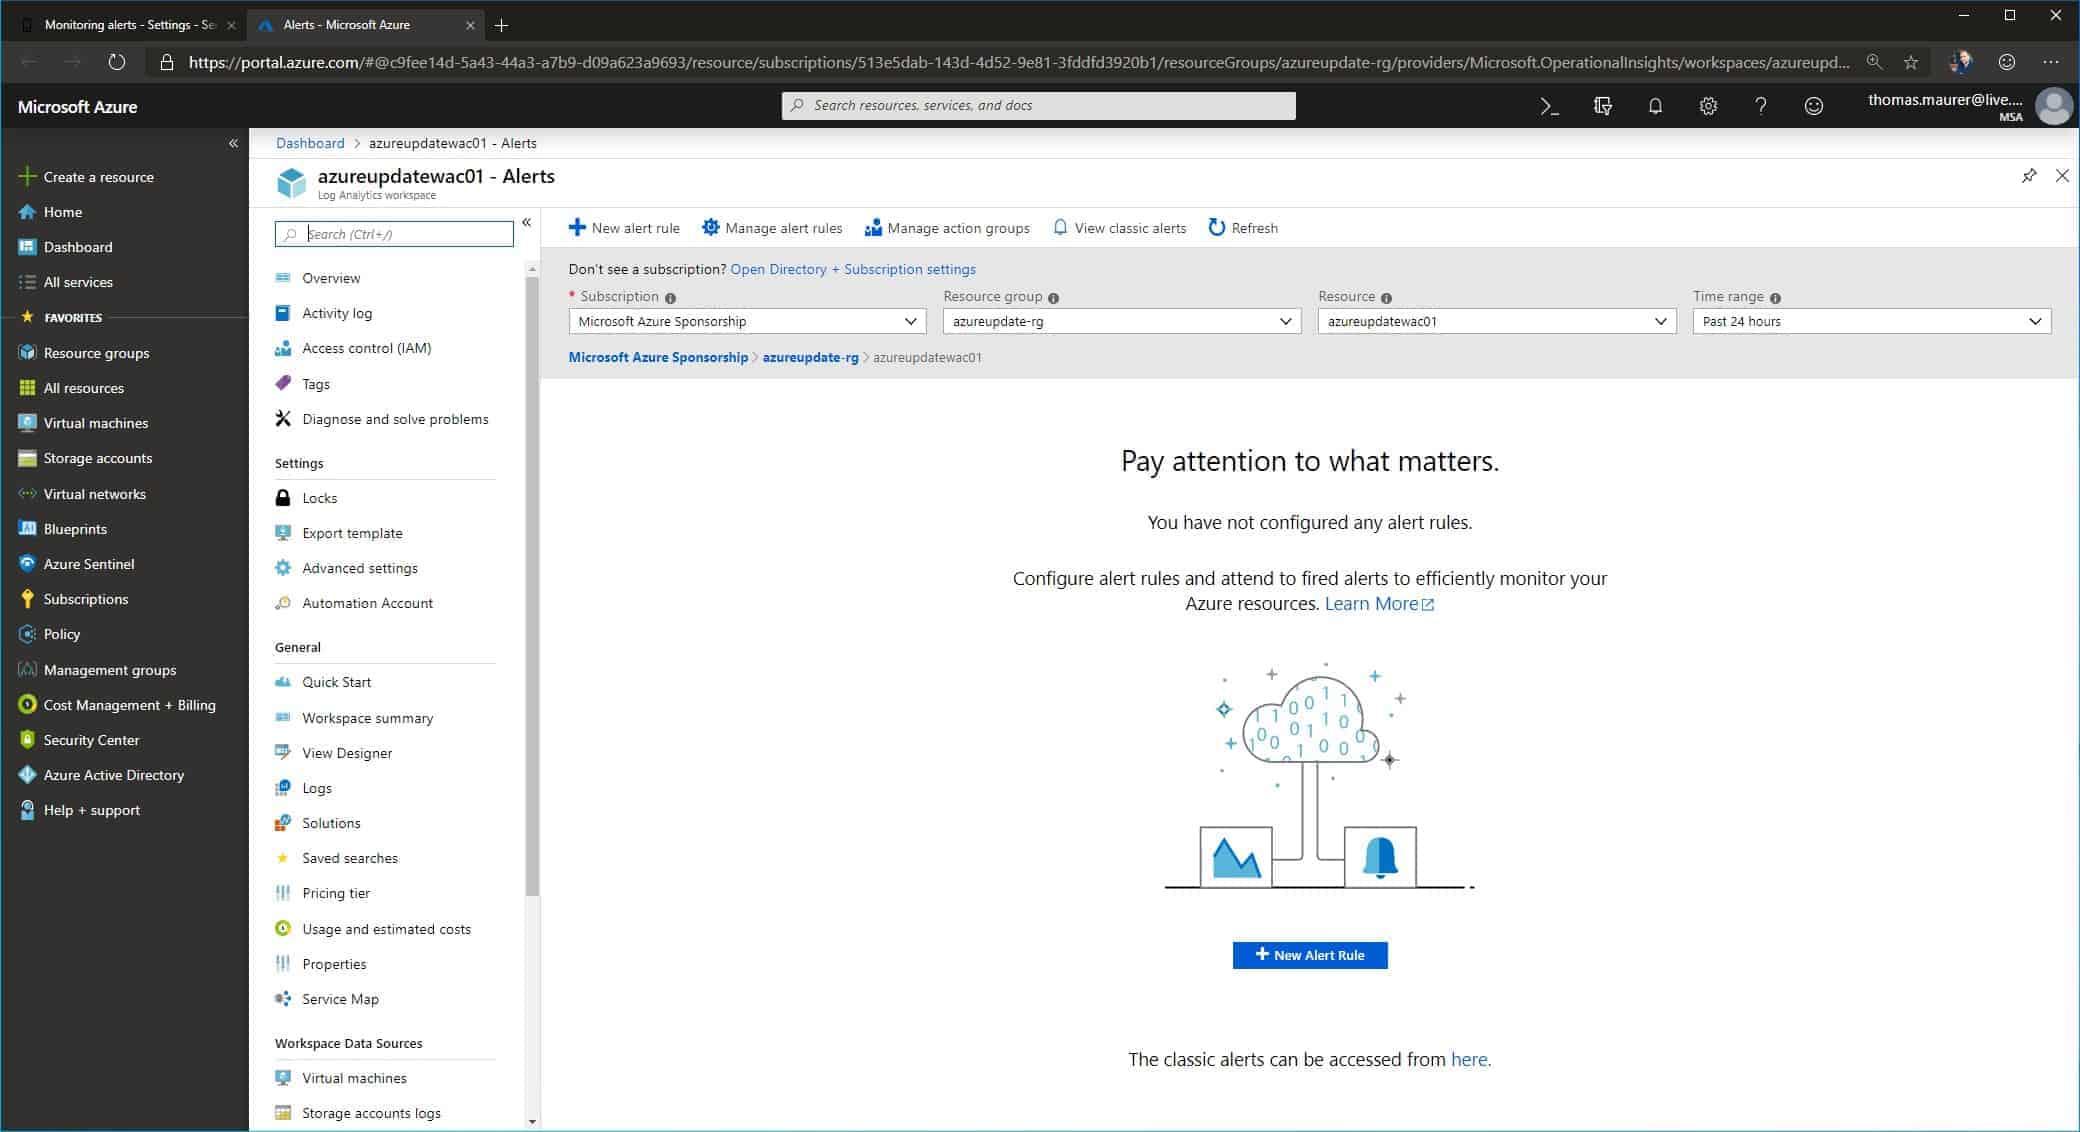 Connect Windows Admin Center to Azure Monitor - Thomas Maurer